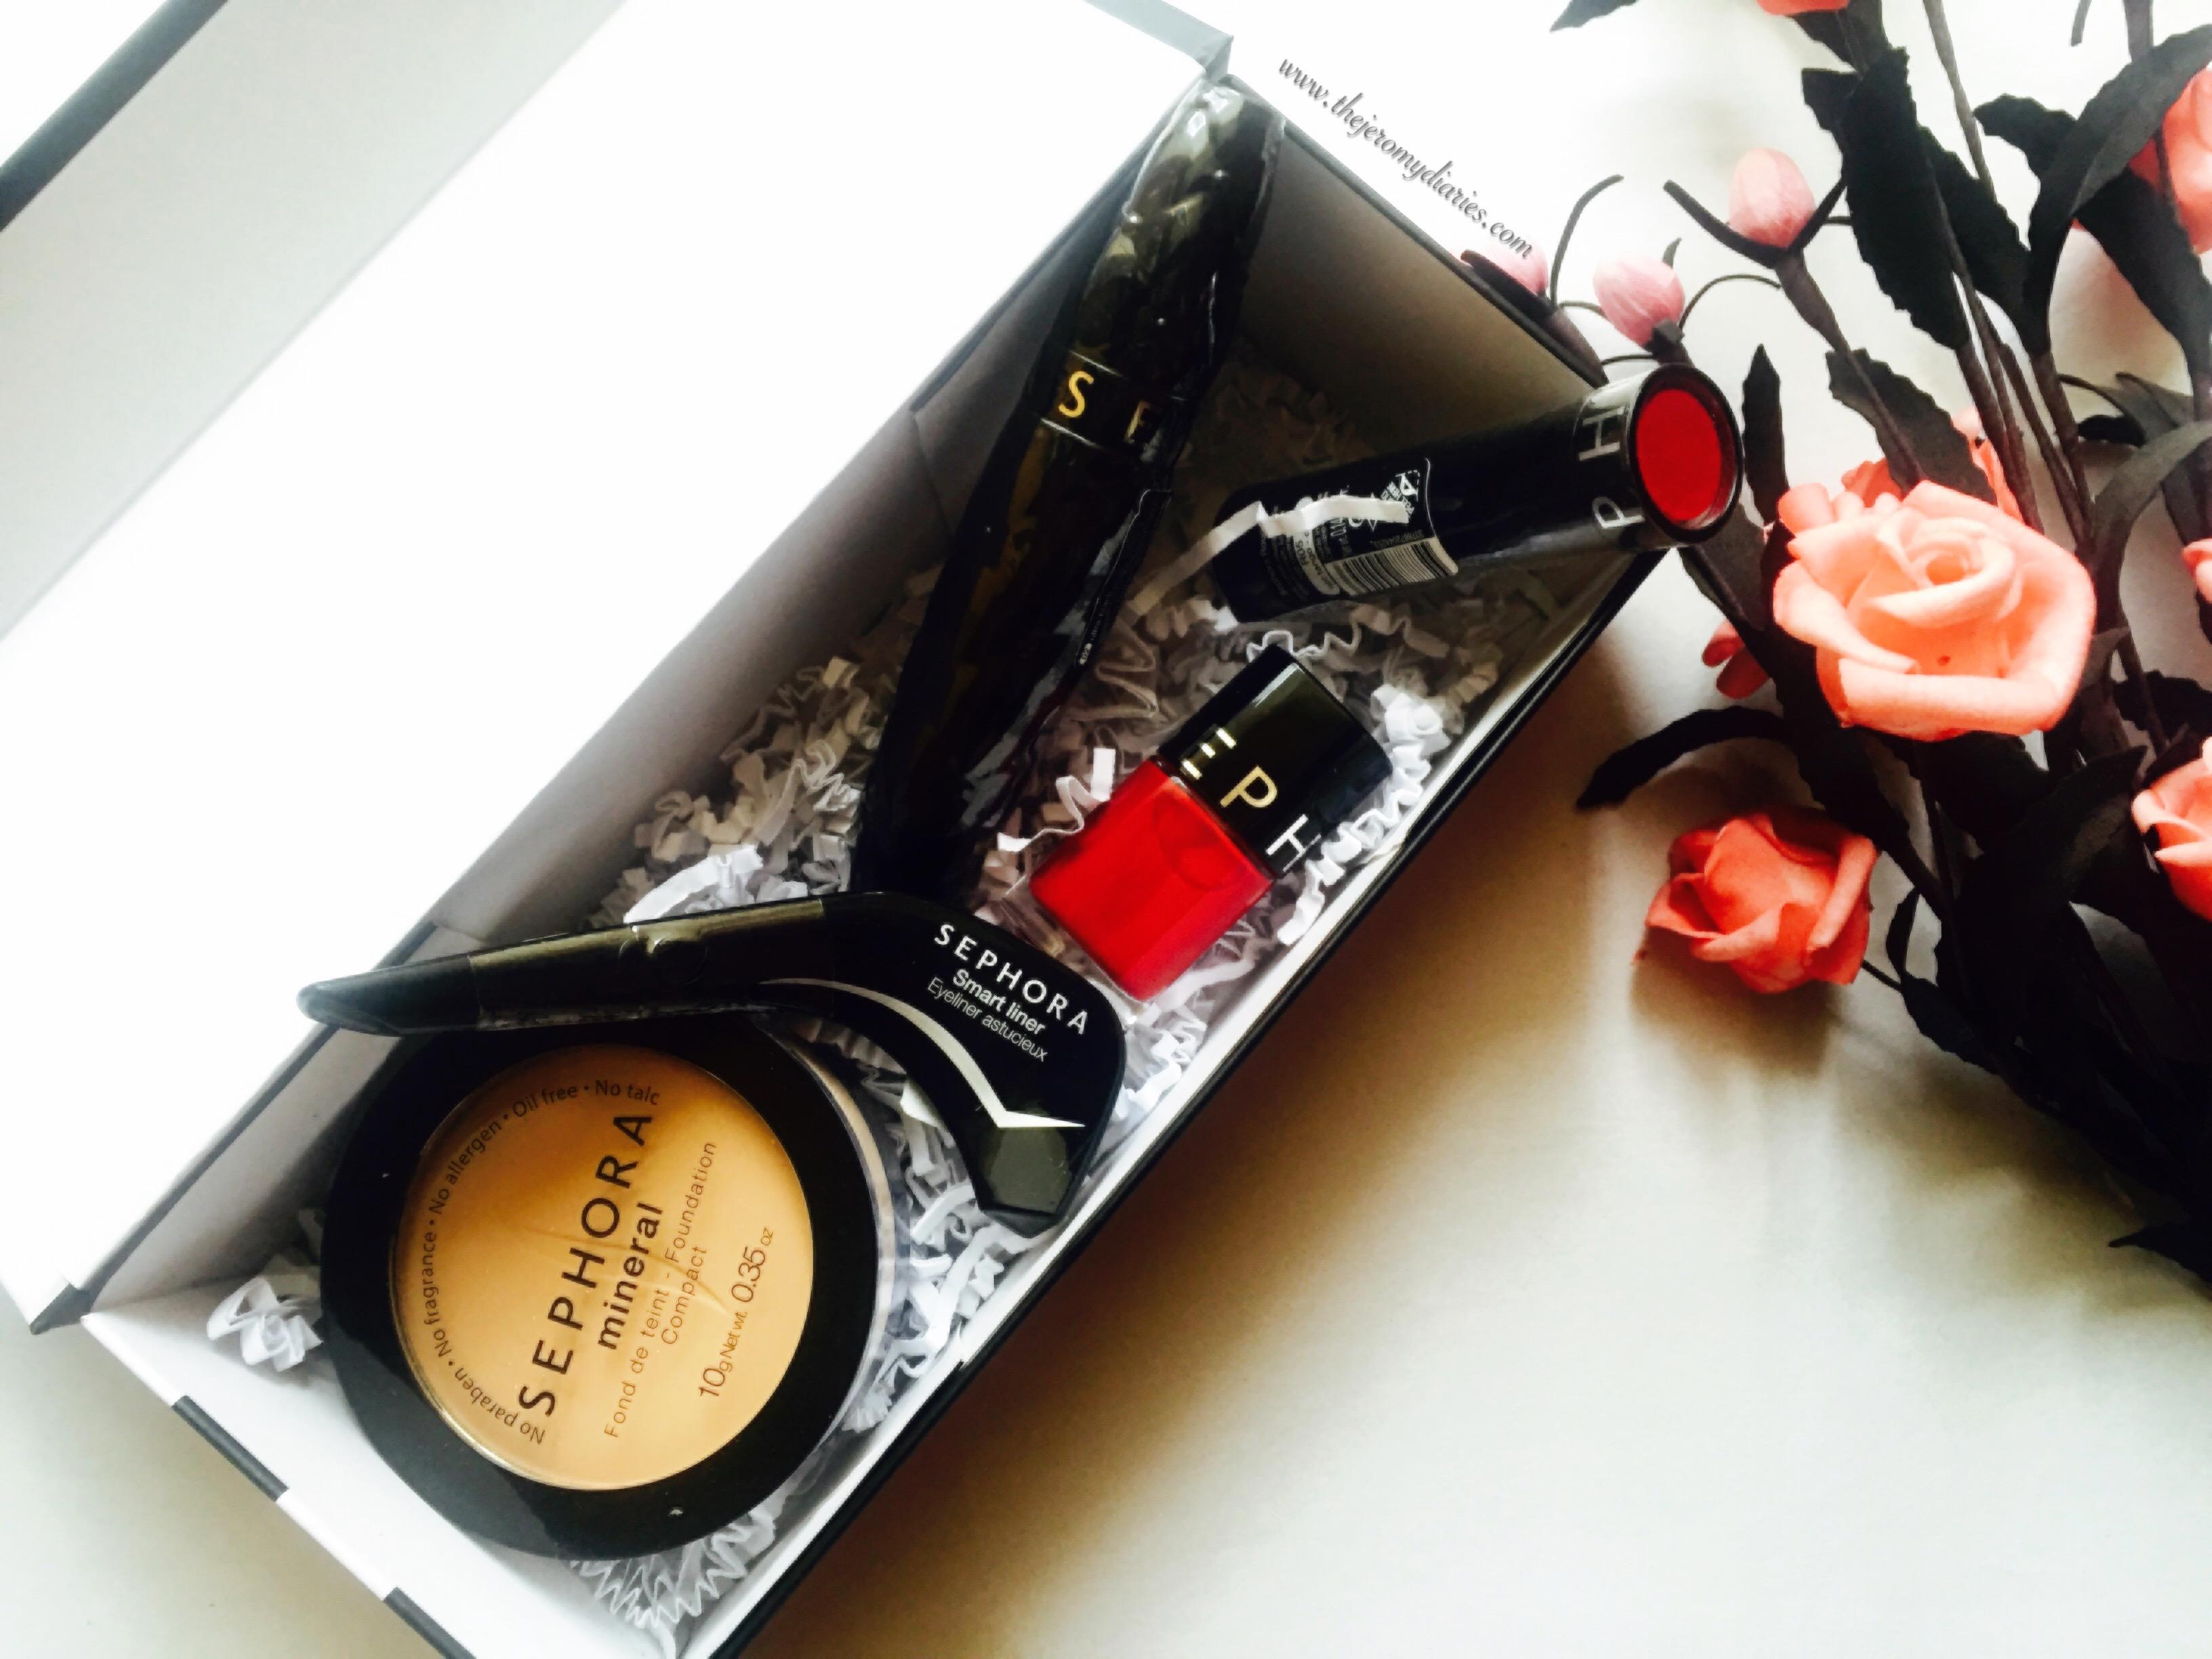 sephora haul the jeromy diaries bangalore beauty blogger (1)